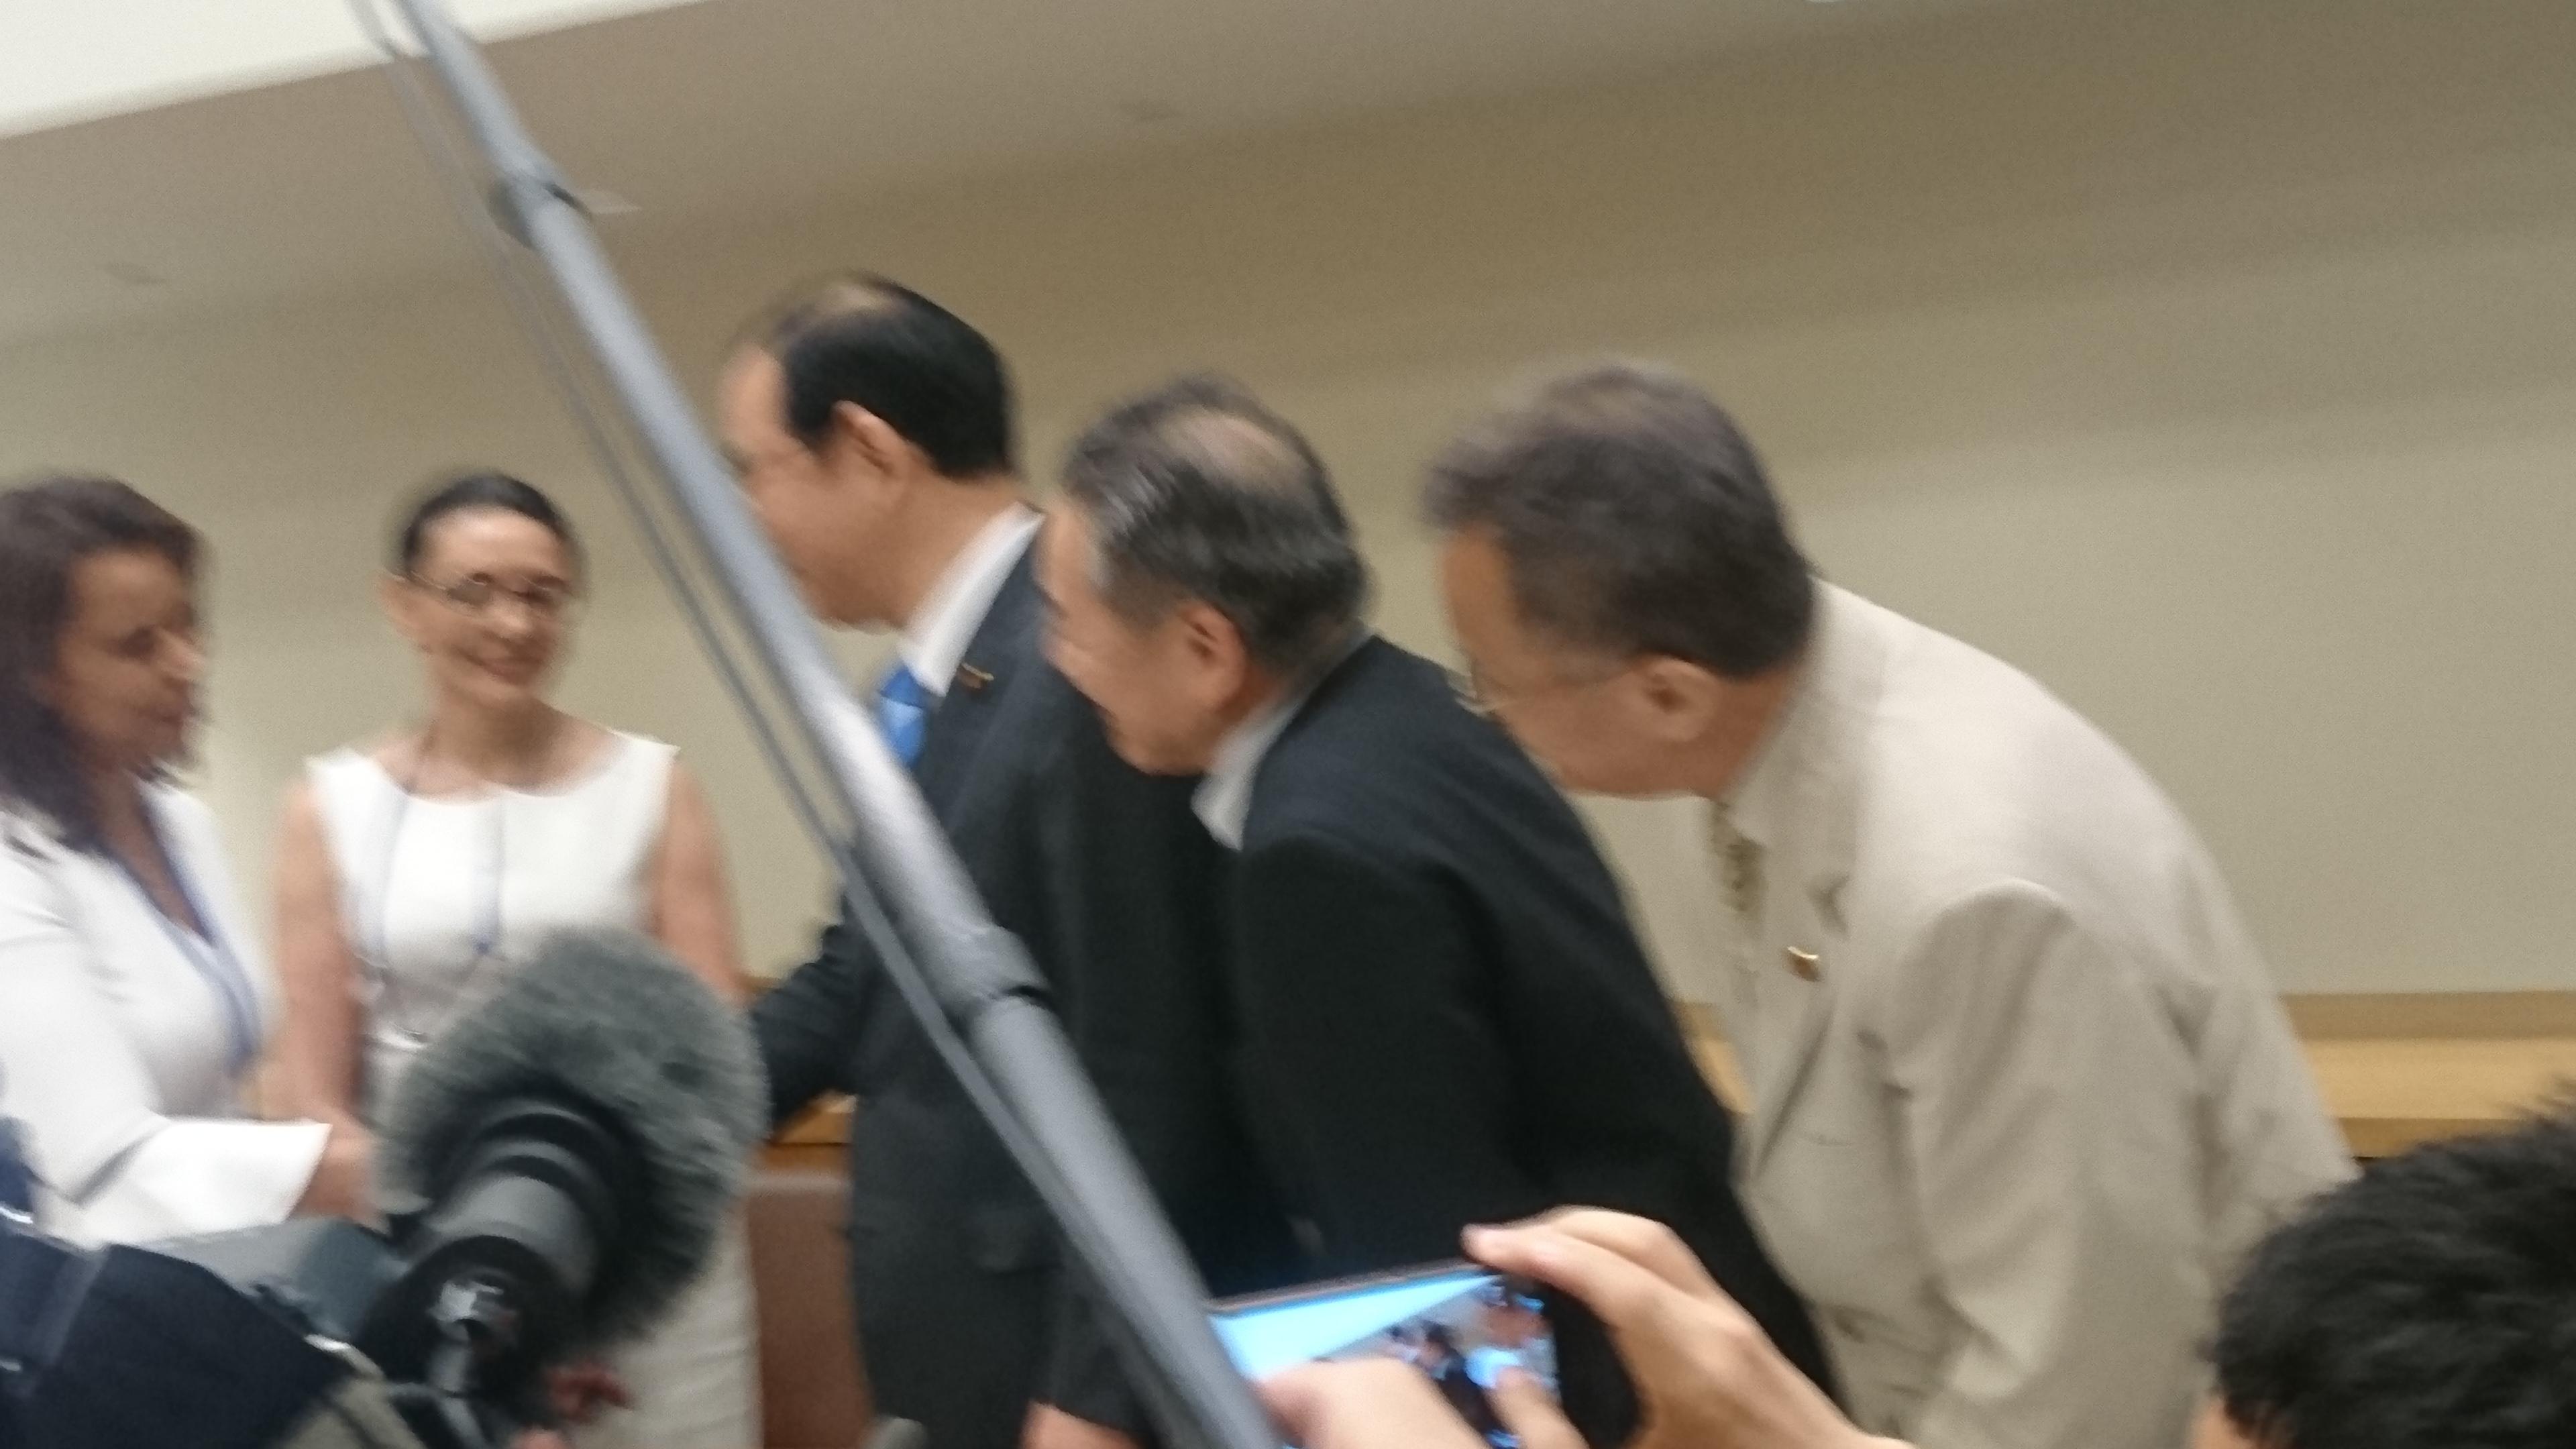 http://www.inoue-satoshi.com/diary/DSC_0372%5B1%5D.JPG